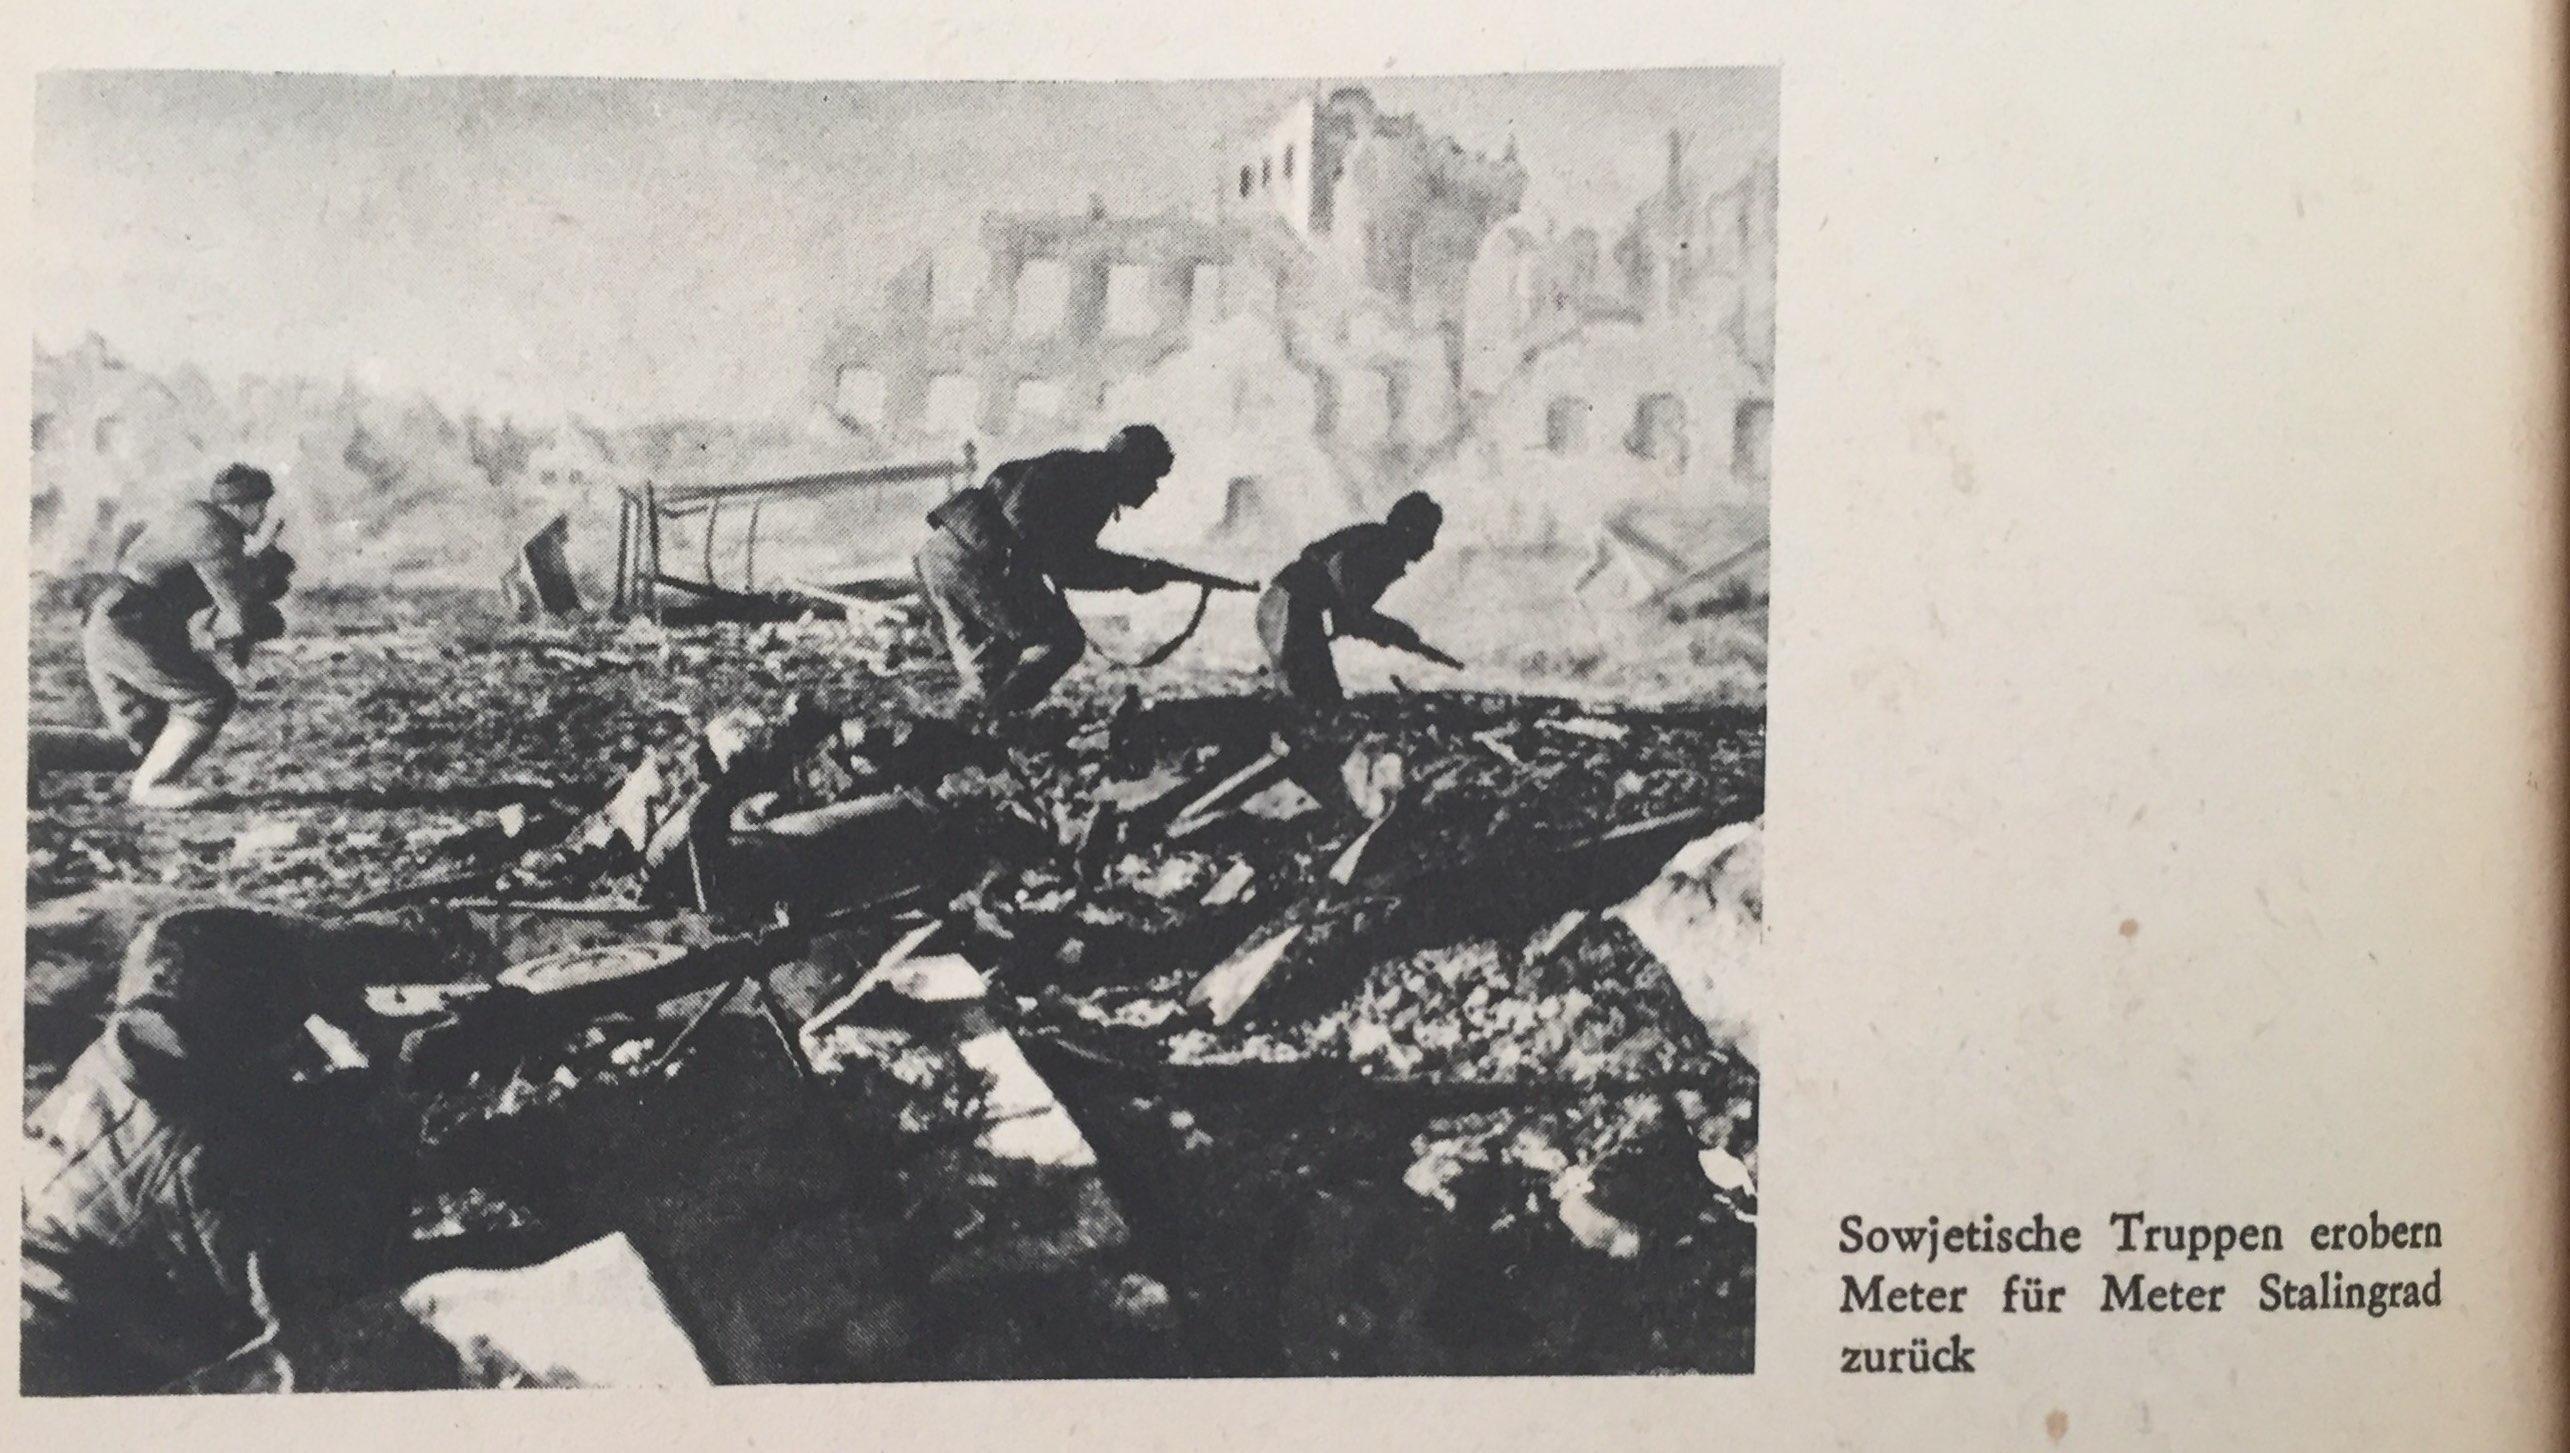 Sowjetische Truppen erobern Stalingrad zurück